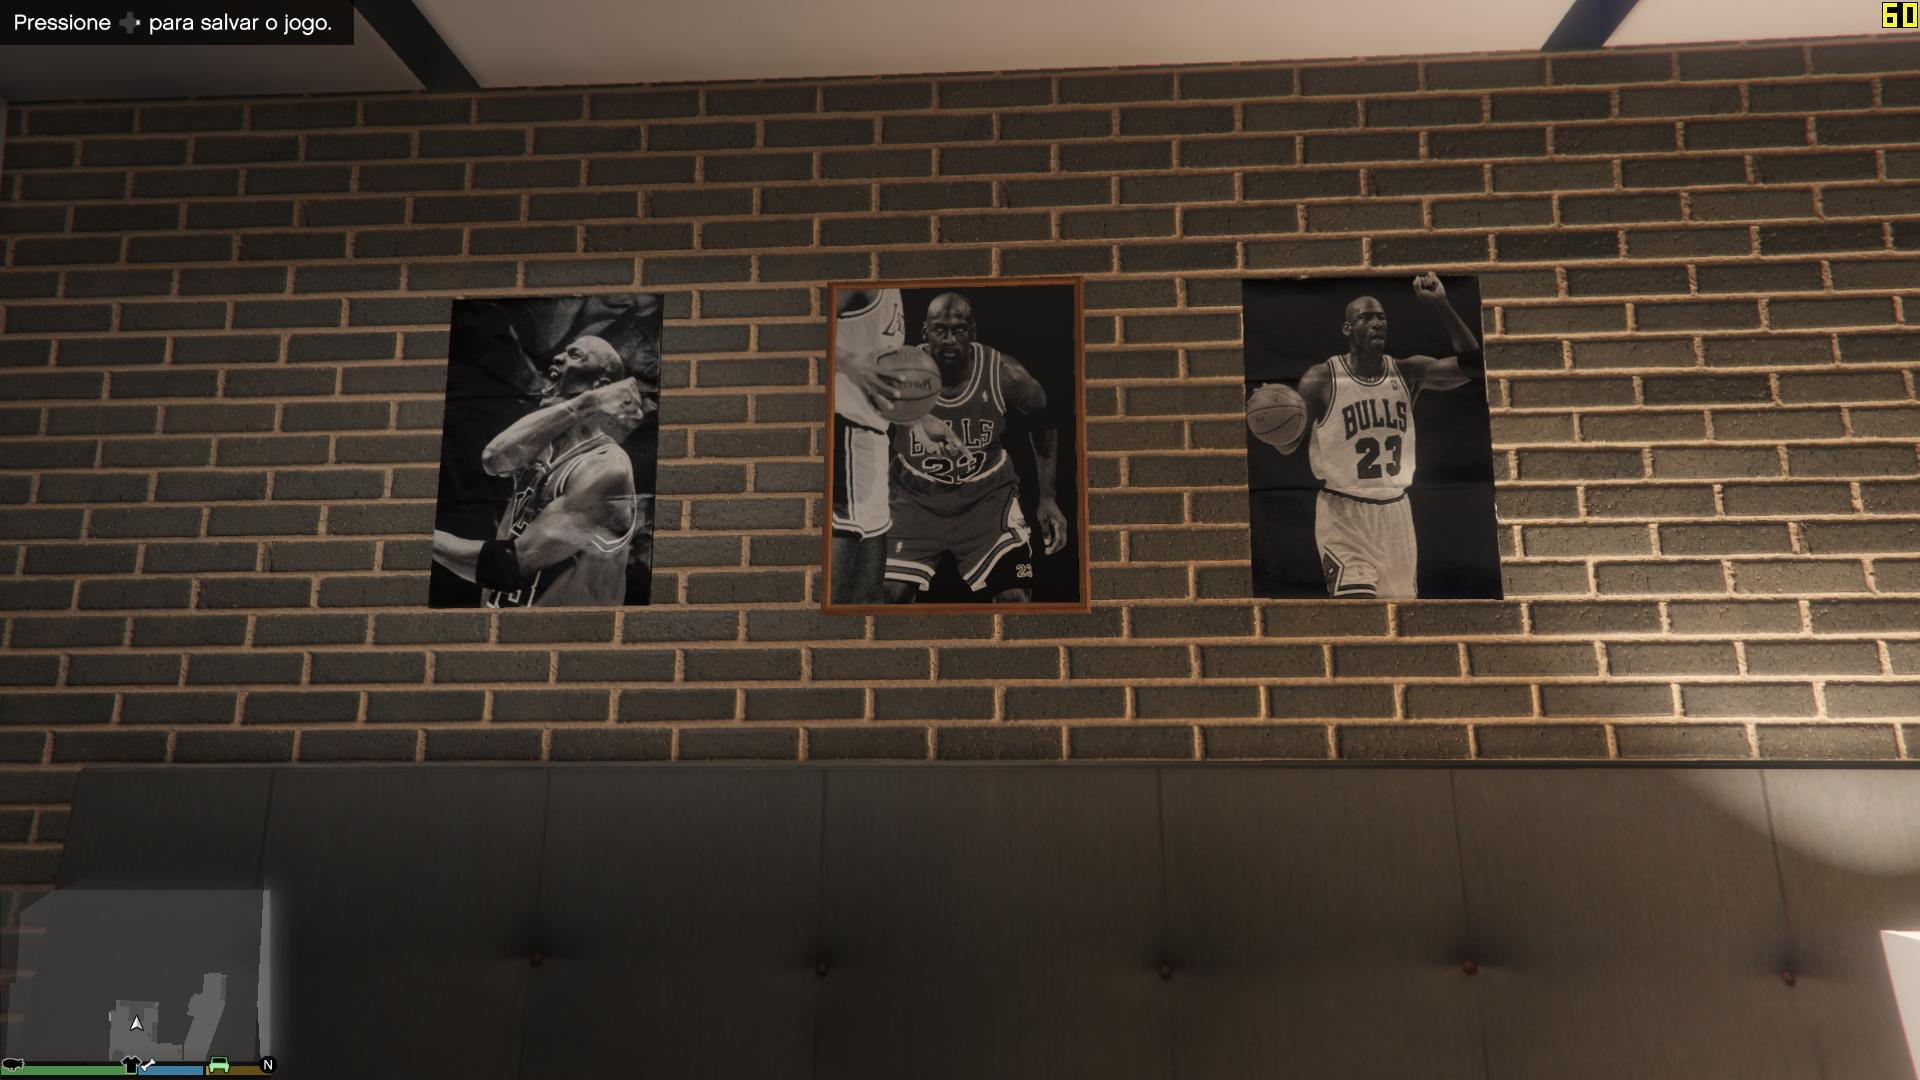 Franklin bedroom posters jordan gta5 for Gta v bedroom wallpaper